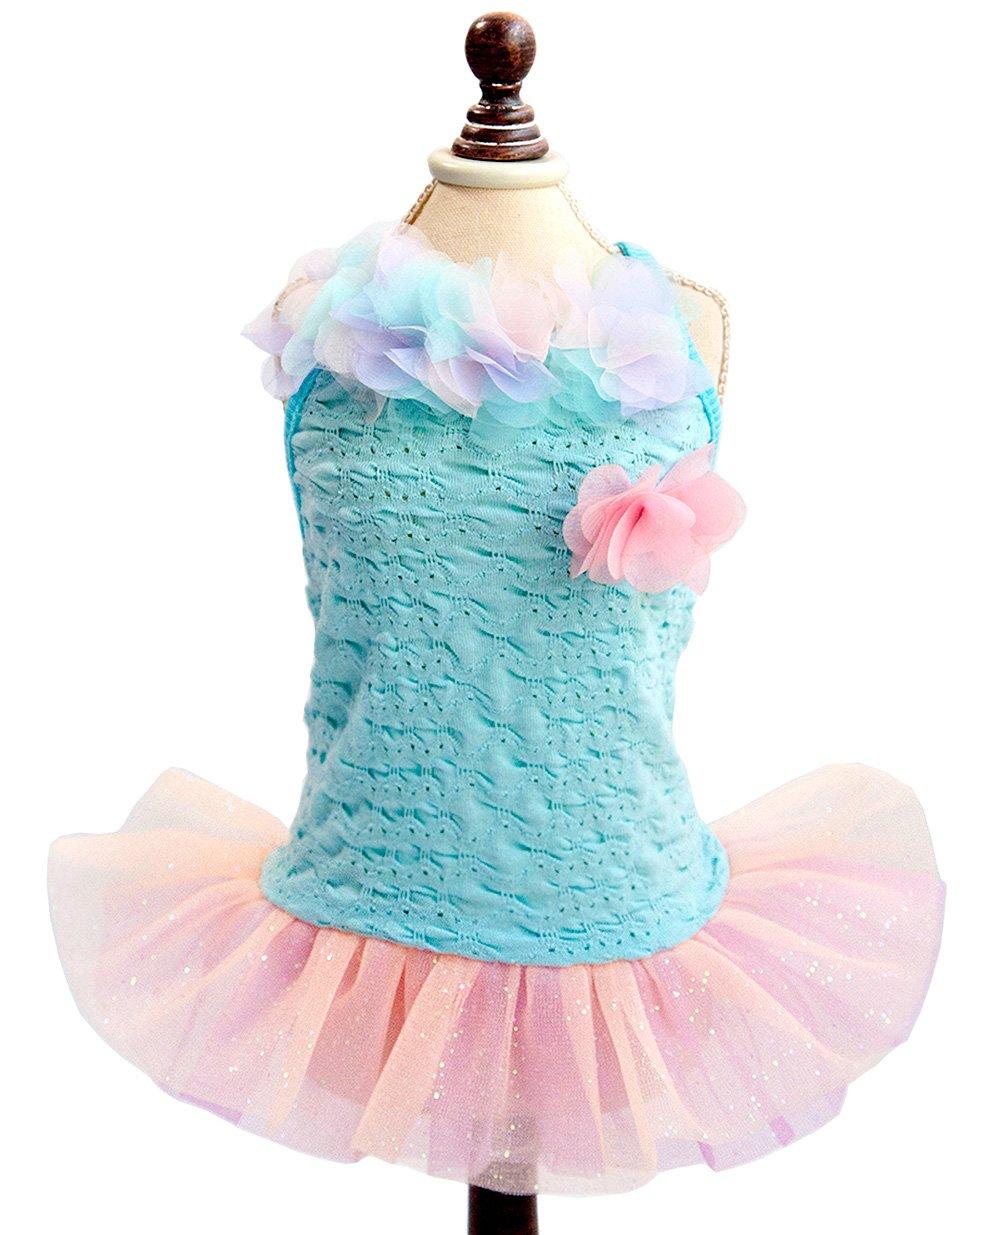 SMALLLEE_LUCKY_STORE Pet Small Dog Puppy Costume Cotton Summer Strap Dress Tutu Flower Trim Blue XS